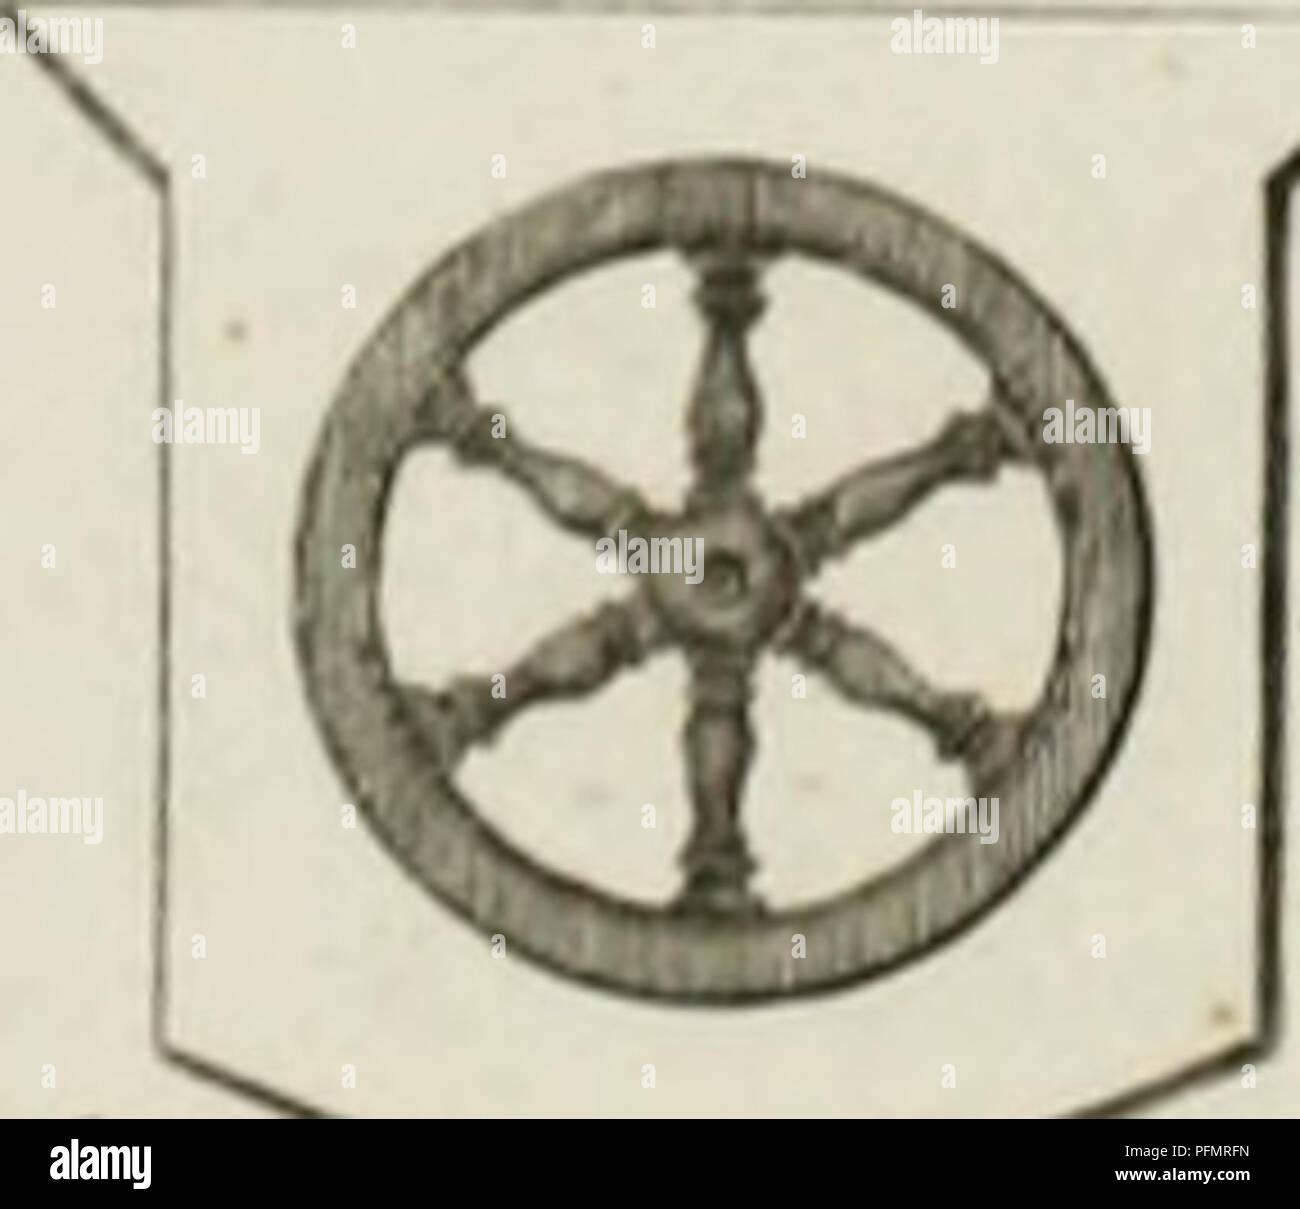 . The cyclopaedia; or, Universal dictionary of arts, sciences, and literature. Plates. Encyclopedias and dictionaries. ii! L, J,  1. j U Y It O TA L '/) / .s- r/.A' CTI O .V .f I'LITE X] rri/irr ,./' (/;, />iik, ,./â ;;./â¢/!⢠Jr ^ />/<â /â¢<â :'i'J'l/II Jiuky or' Uiiaba-ltind JhtJ^L- of Su.(. cr' iHoni'i.ffcr CharlotUju4fu.ftti Maiihitt miA y'm;(ir ..-..⢠^uiruMti â '^on/ii,t /'rin,;:M EUuii*vih v I /»â ..â¢/ .!'.â Â« zh:^^ FIRST BOUSE 'â¢'⢠iiovsi: ioflnil IllH'SK 3 4 ^ ^ riirii nvrsi: © © si.TU Jiovsi: *i?isZ/^ Xtvt^itfi yp/i Il'whlli Son _ yi/itfi Xon # # ittidne  - Stock Image